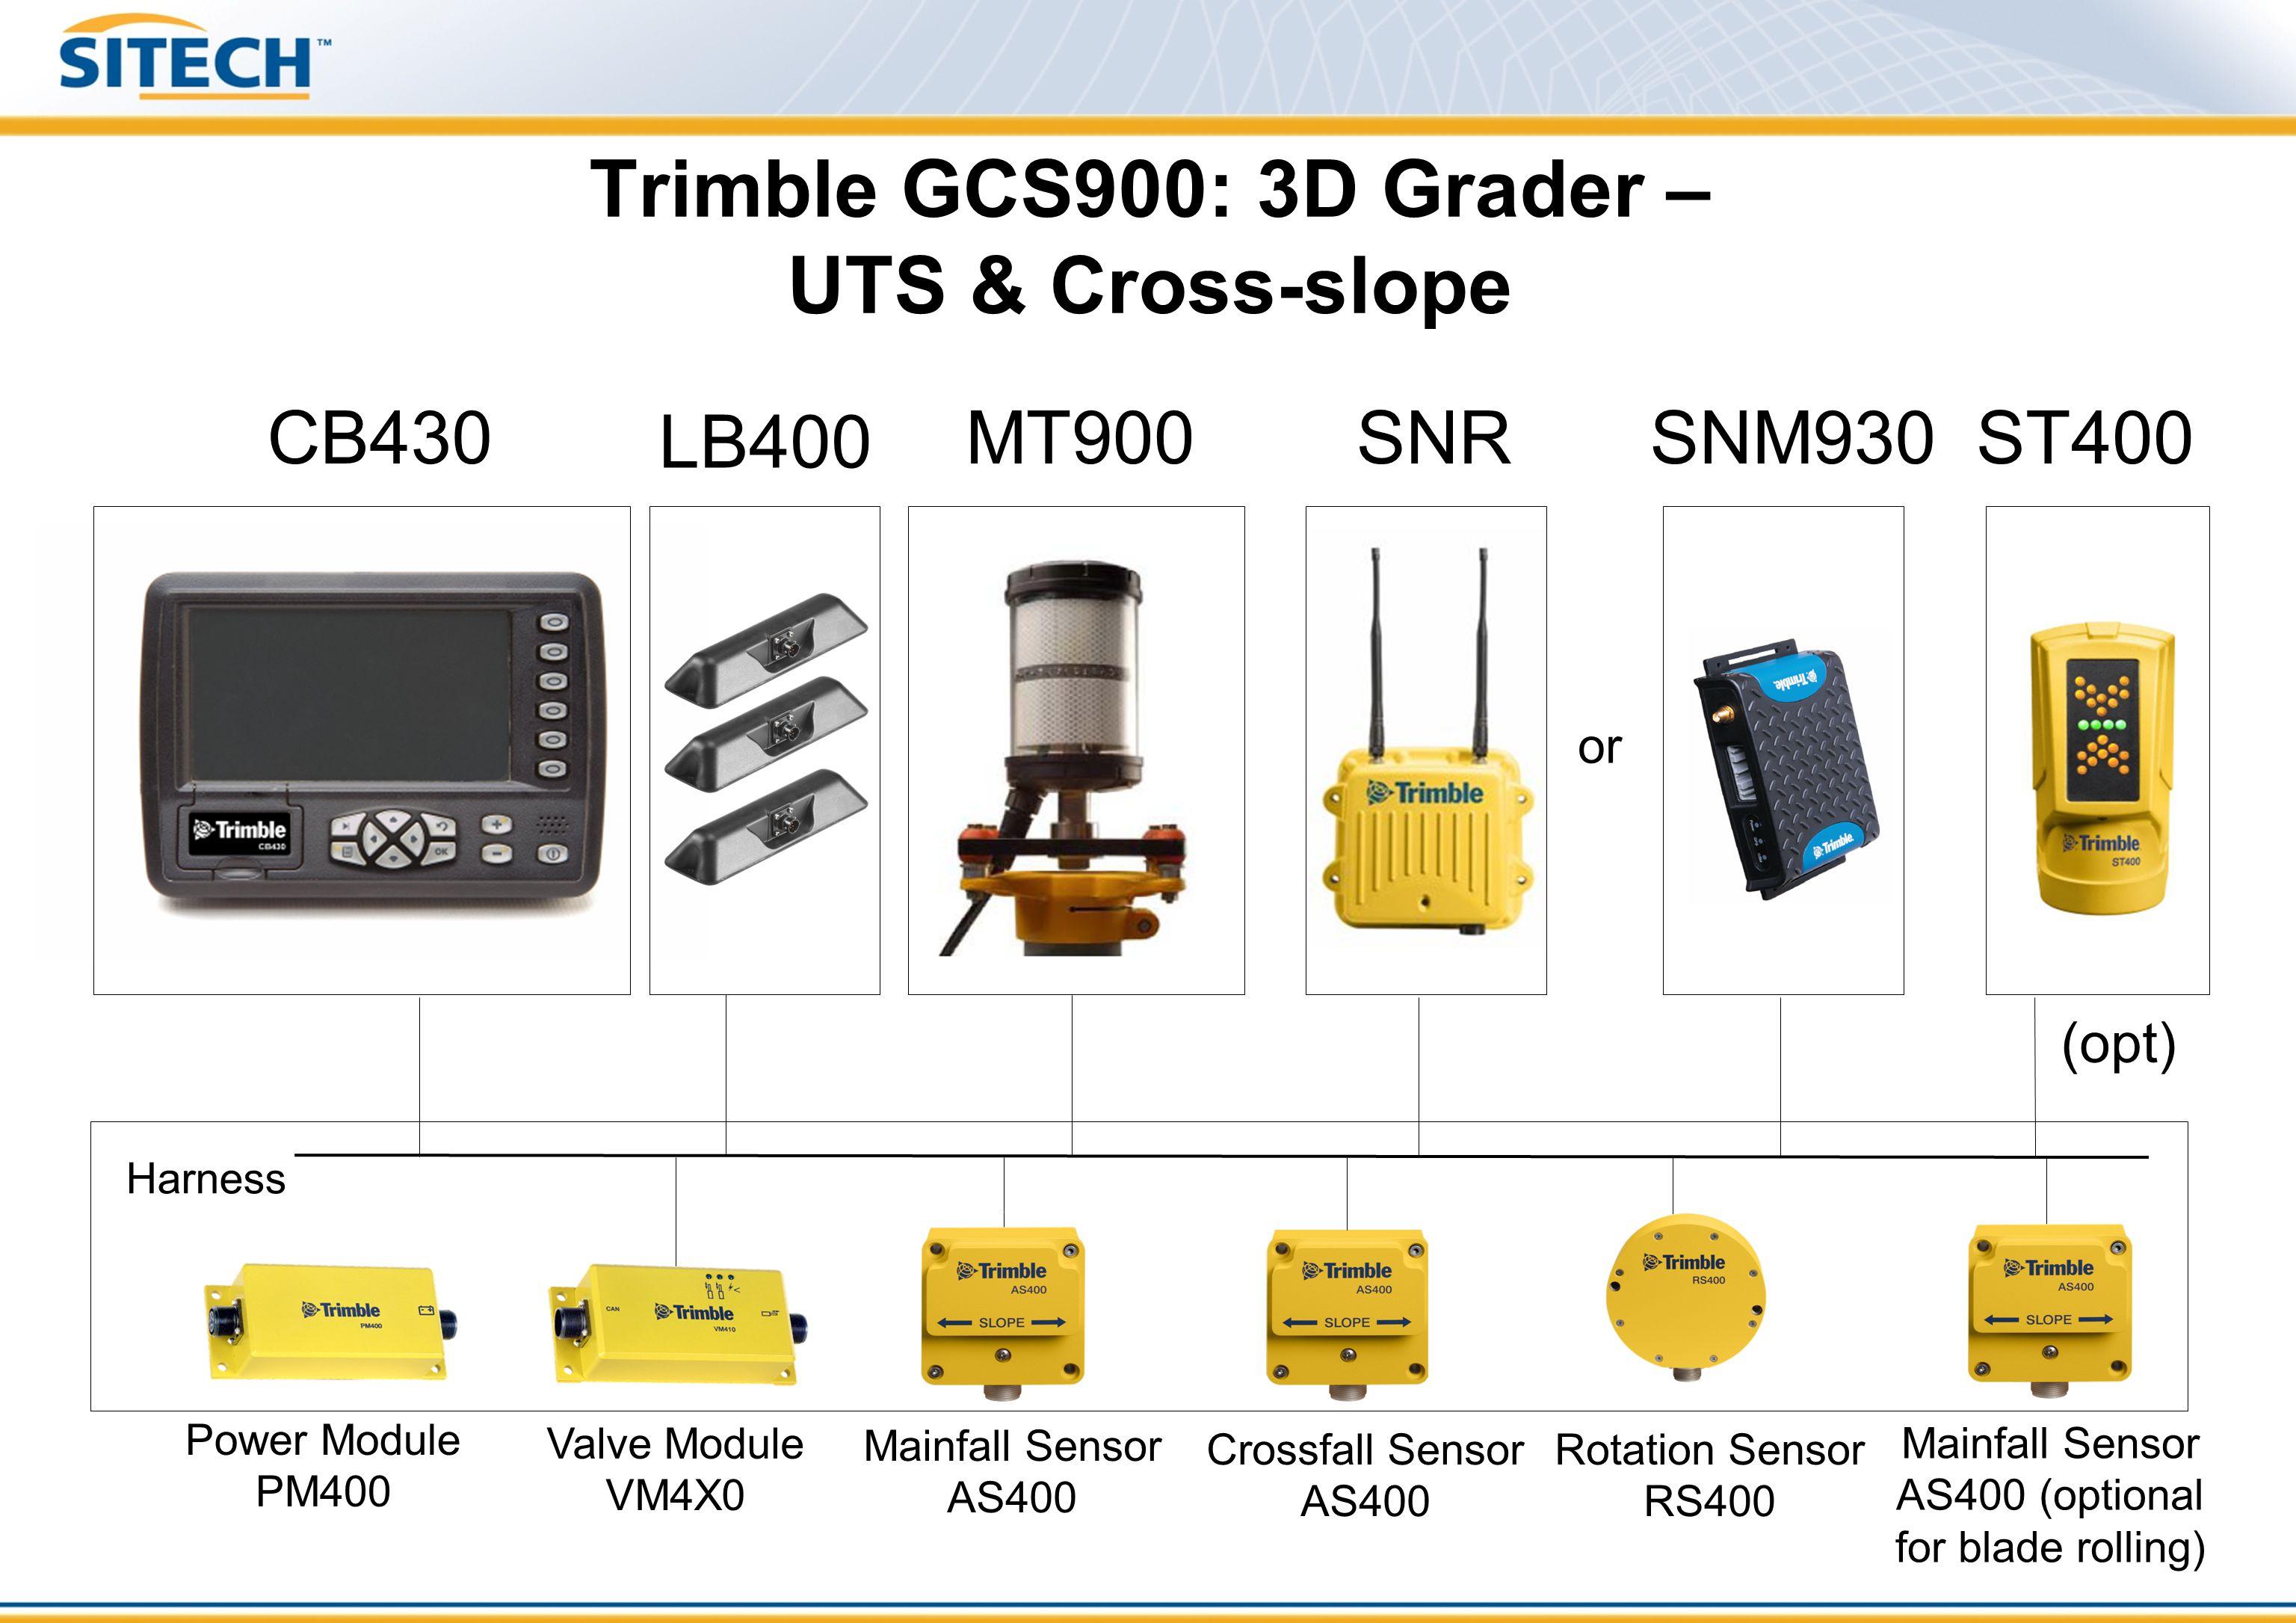 Trimble GCS900: 3D Grader – GNSS & Cross-slope ST400 (opt) Harness Power Module PM400 Valve Module VM4X0 Mainfall Sensor AS400 Crossfall Sensor AS400 Rotation Sensor RS400 Mainfall Sensor AS400 (optional for blade rolling) CB430 LB400 SNRMS9X0SNM930 or